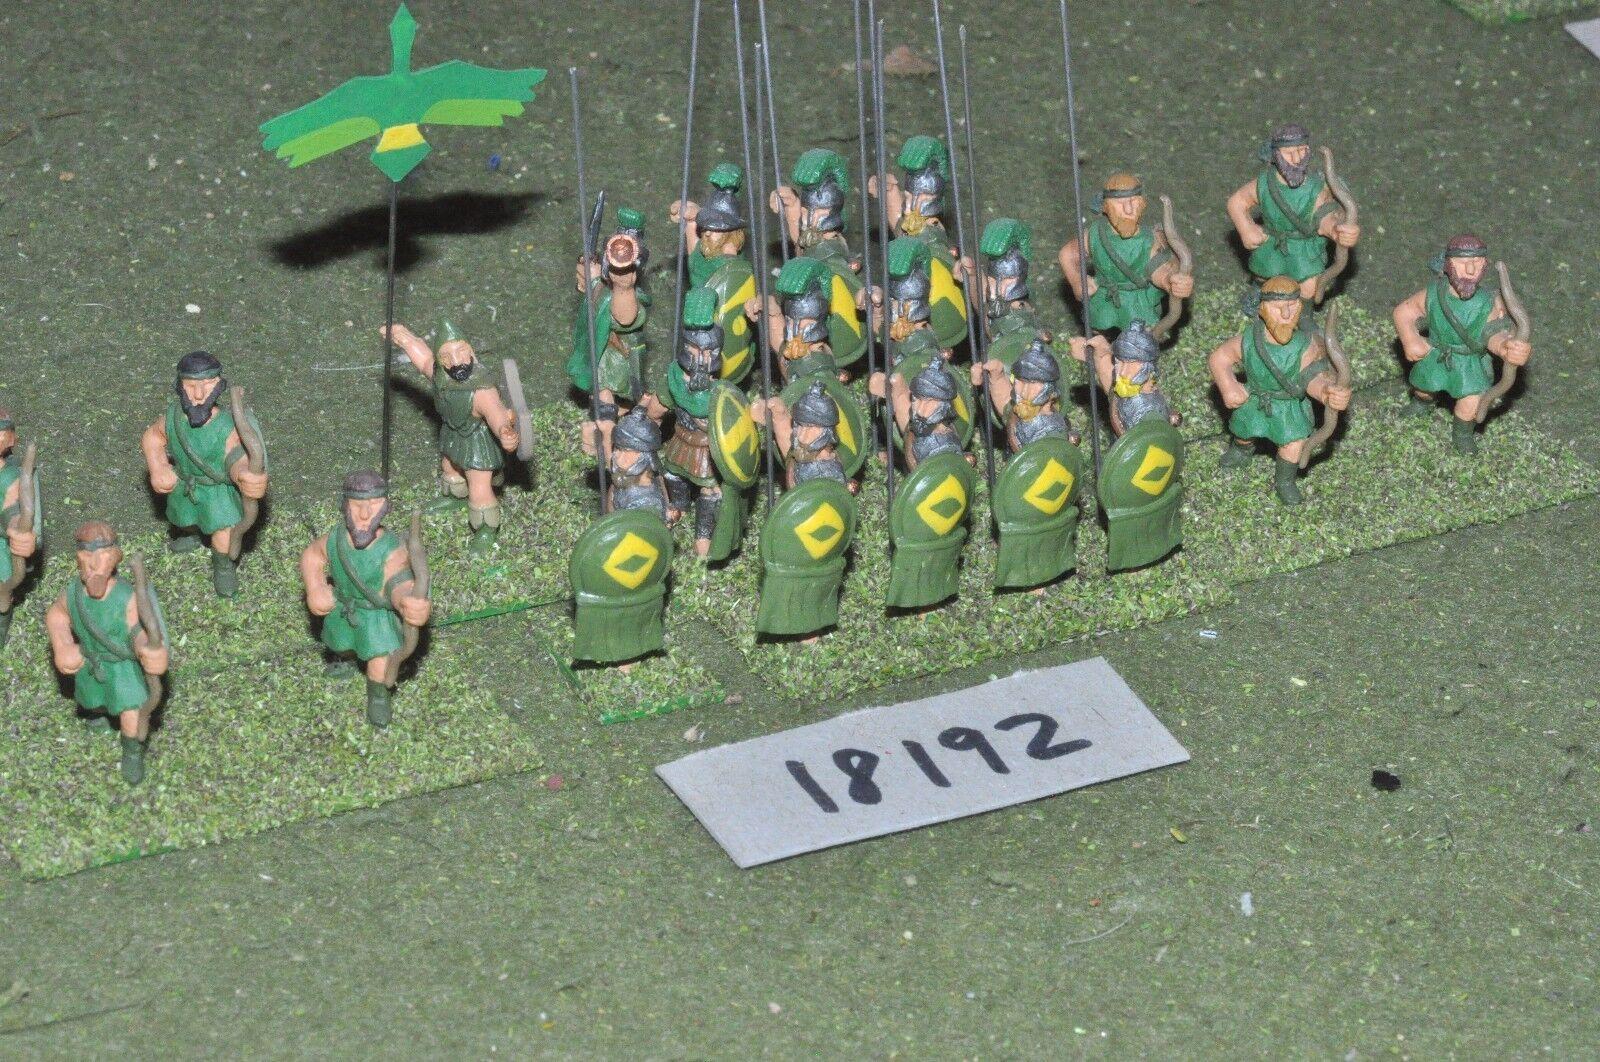 Ven a elegir tu propio estilo deportivo. 25mm 25mm 25mm griego clásico-antigua batalla Group-INF (18192)  mejor vendido